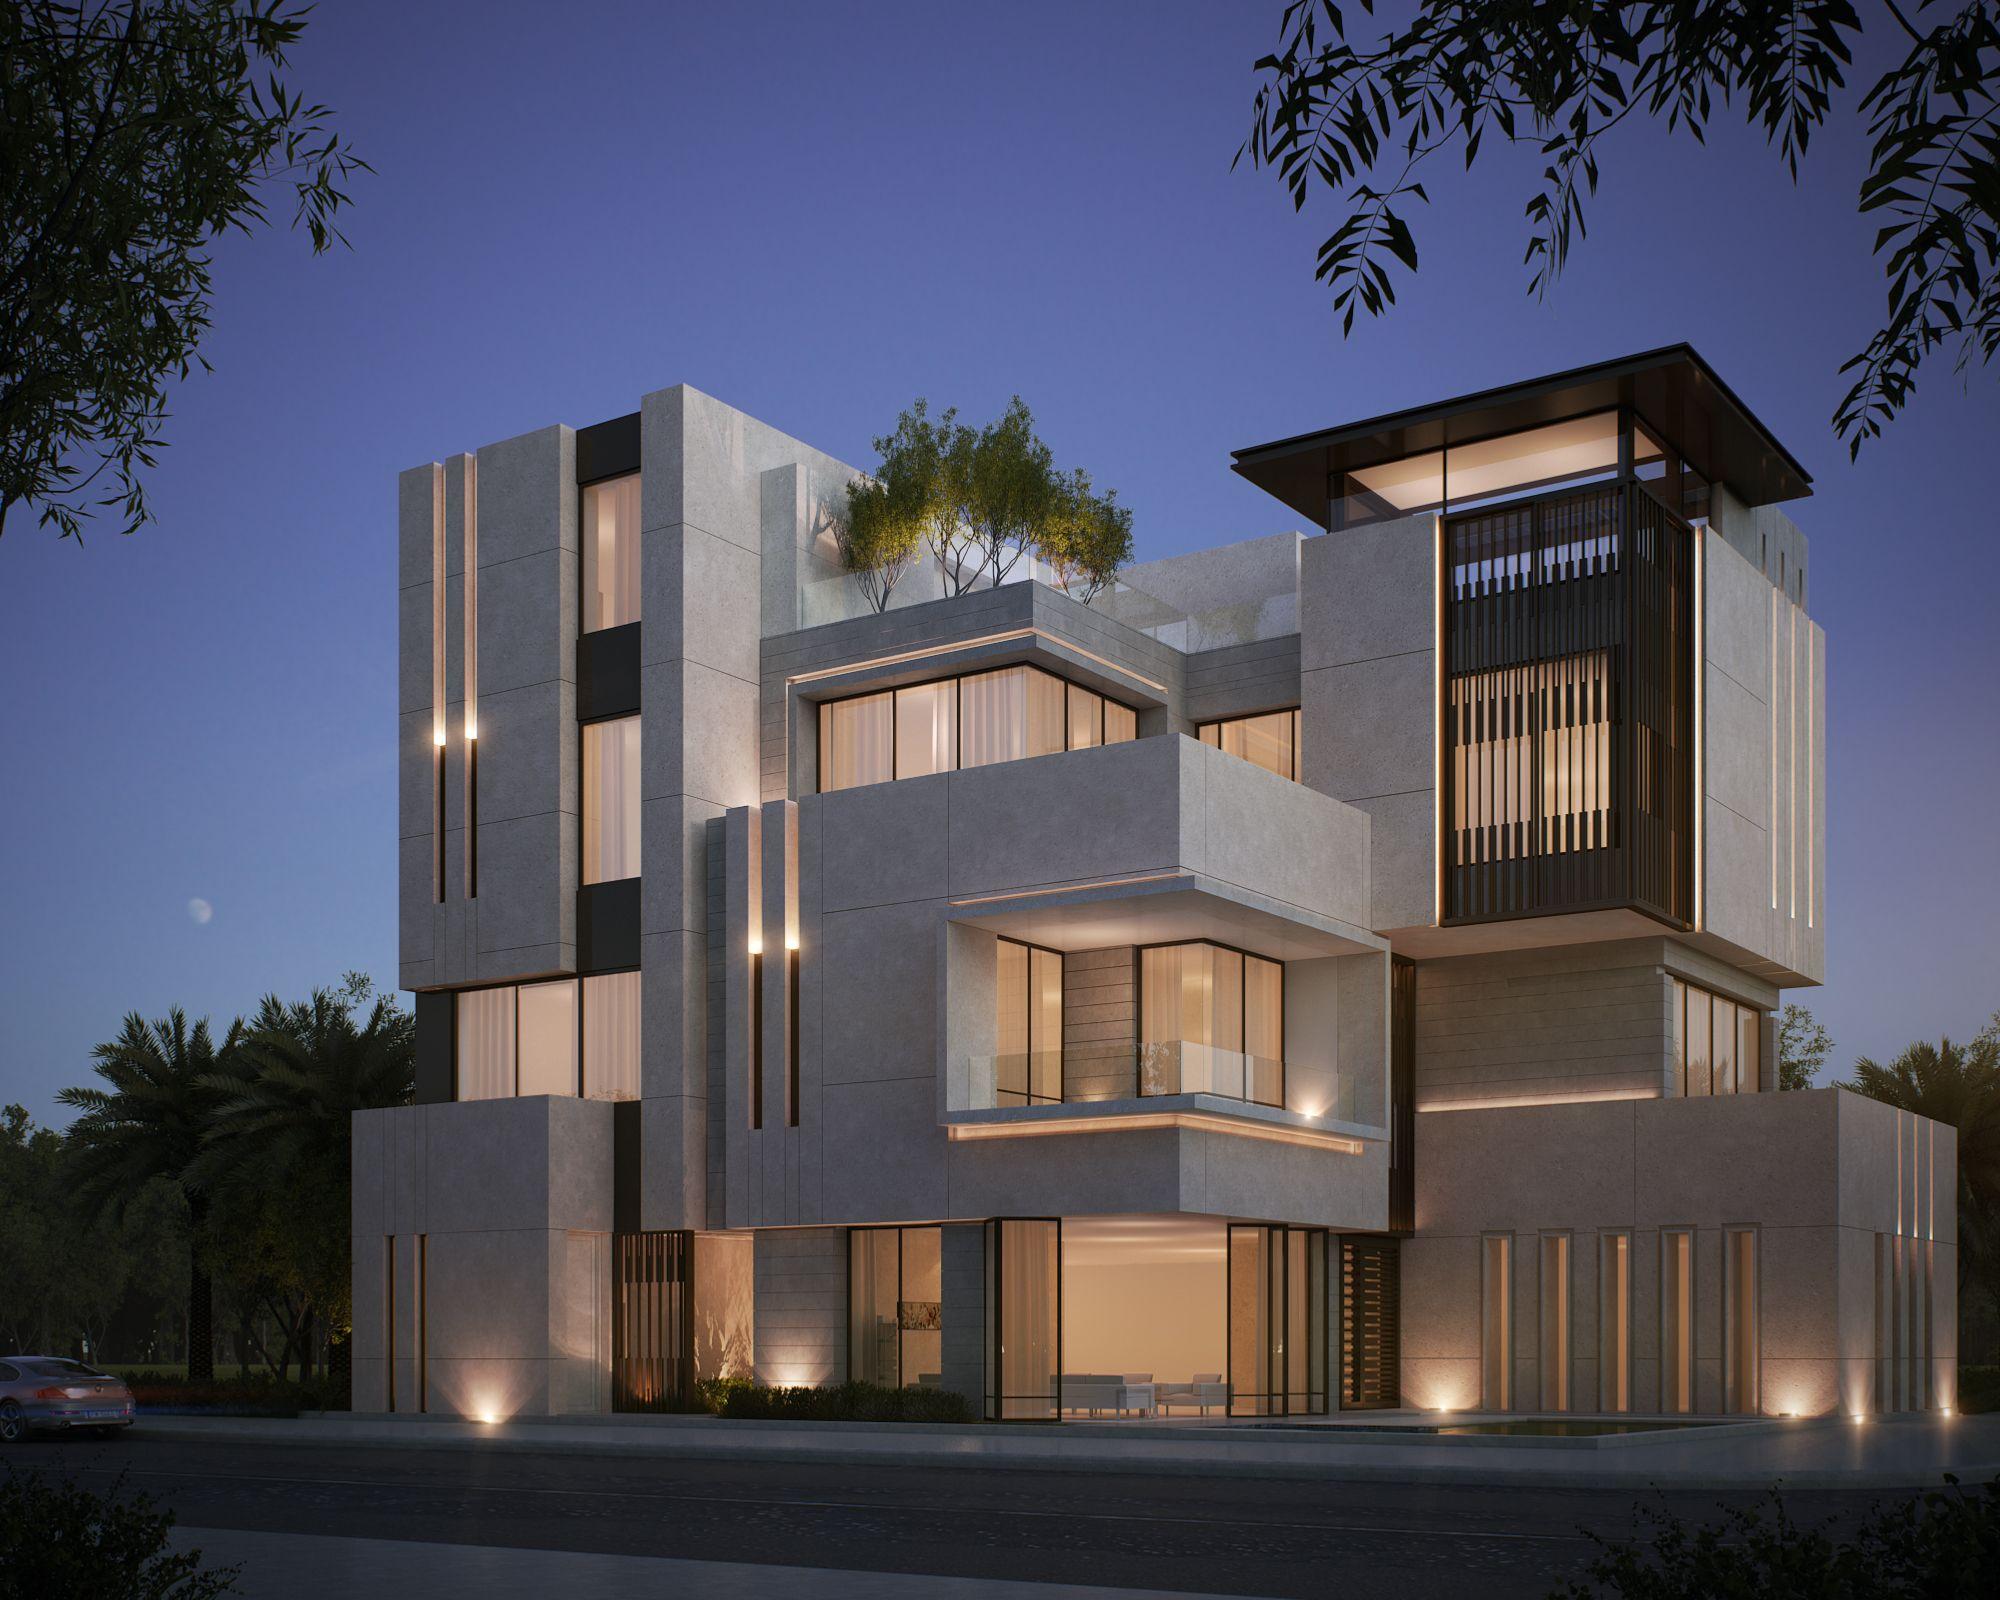 Private Villa 500 Kuwait Sarah Sadeq Architects